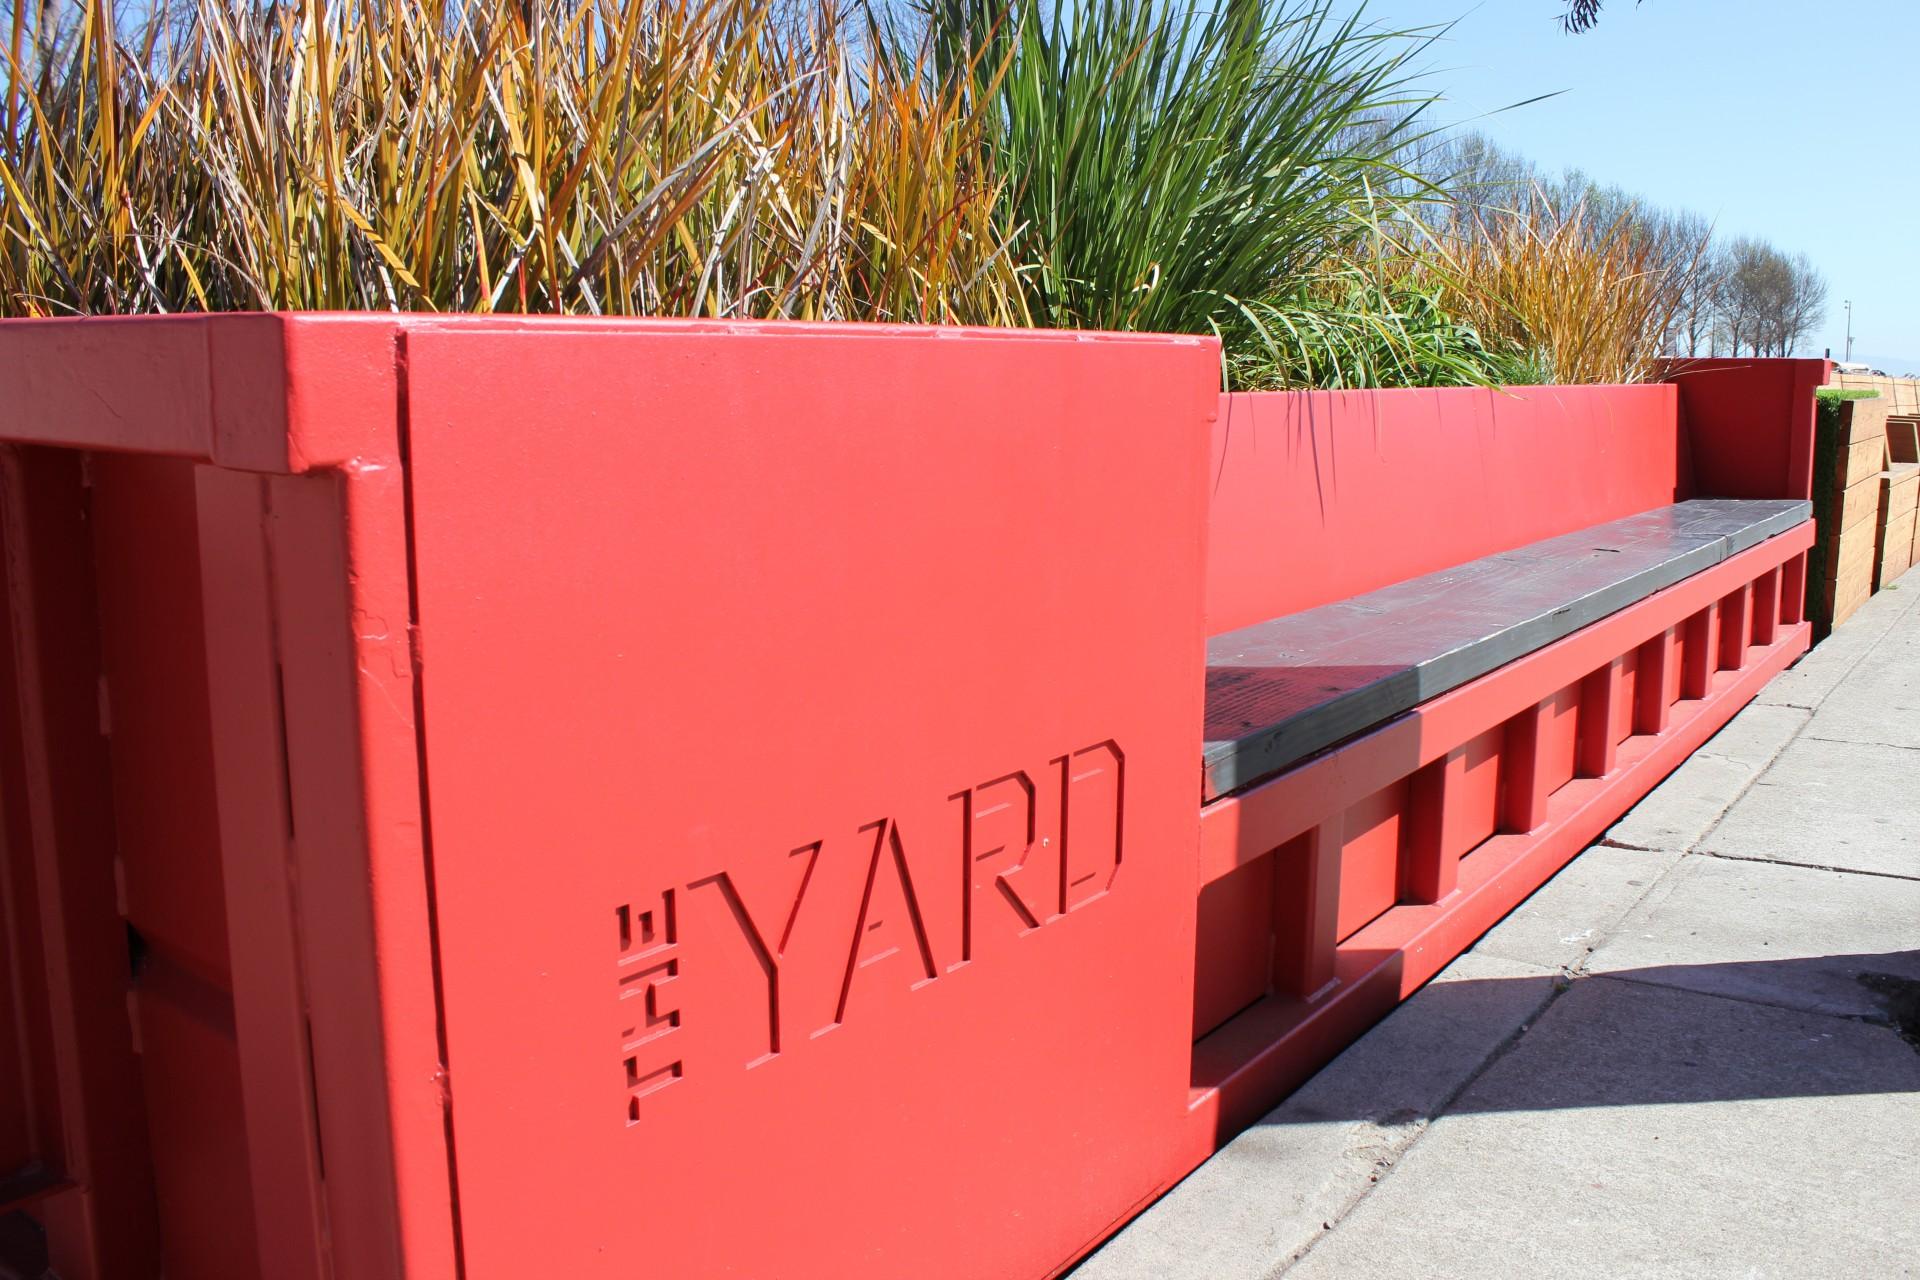 01_The Yard_12.jpg